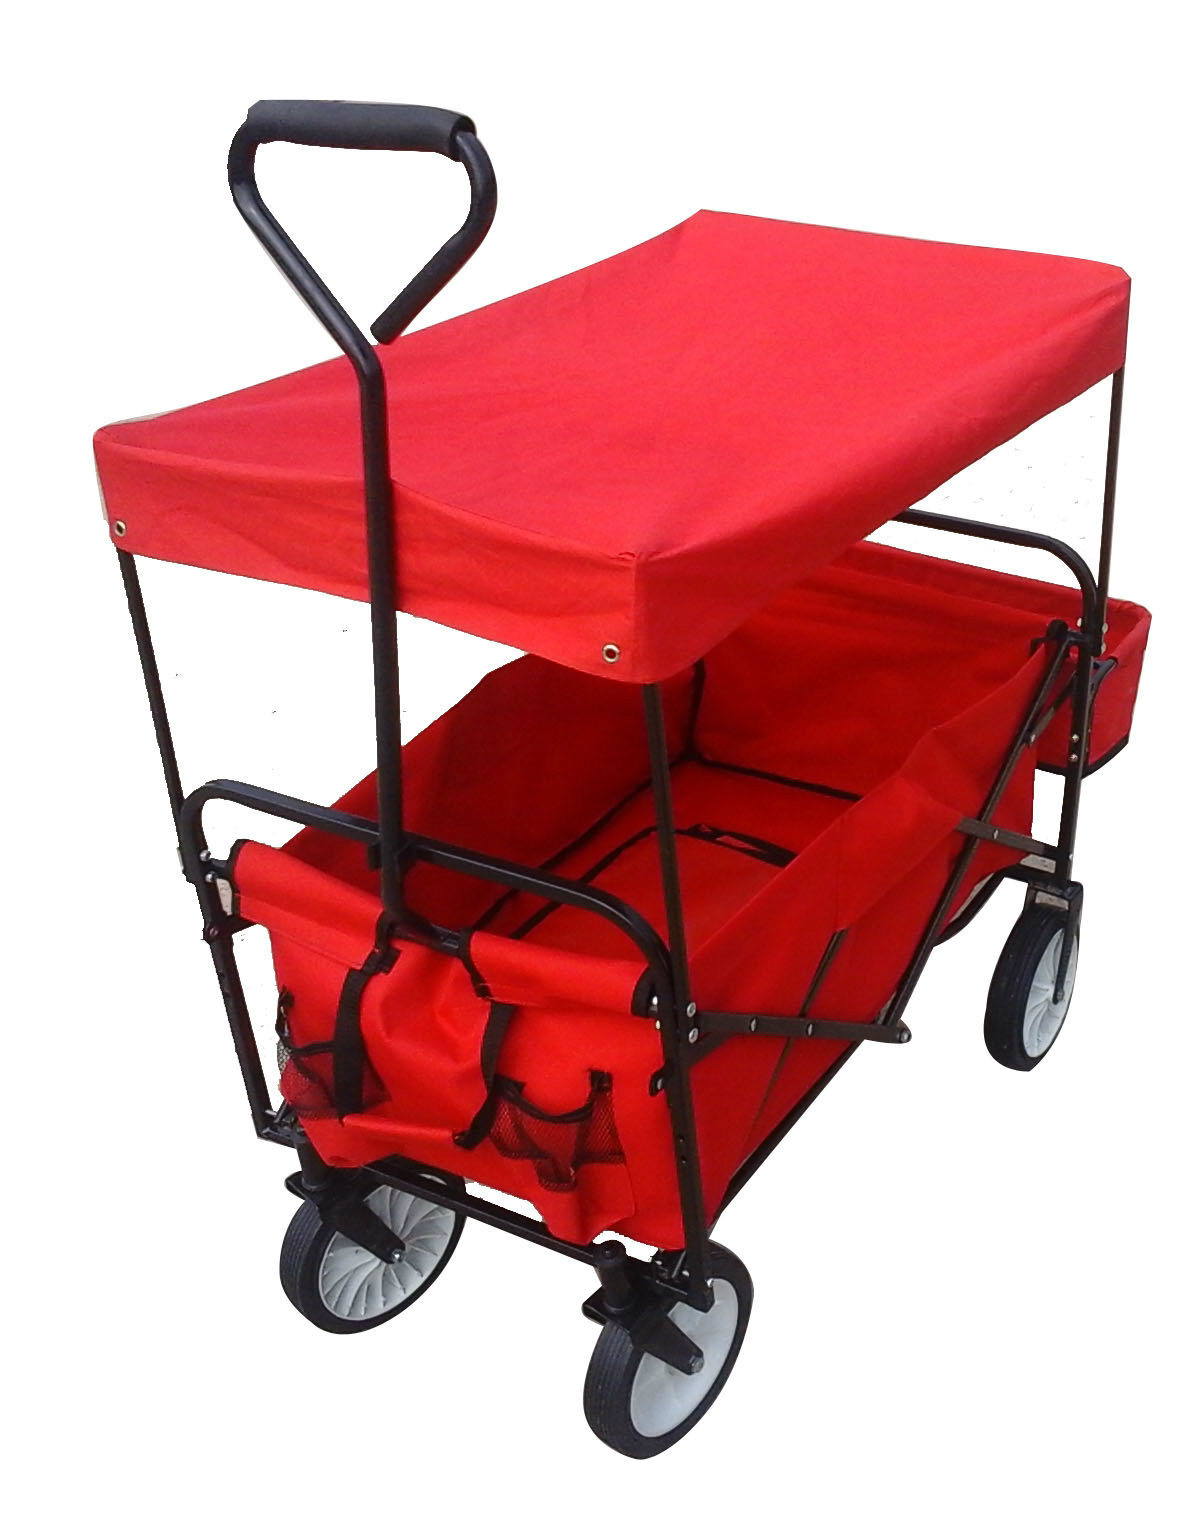 Factory Outlets Center Folding Metal Wheelbarrow Folding Trolley